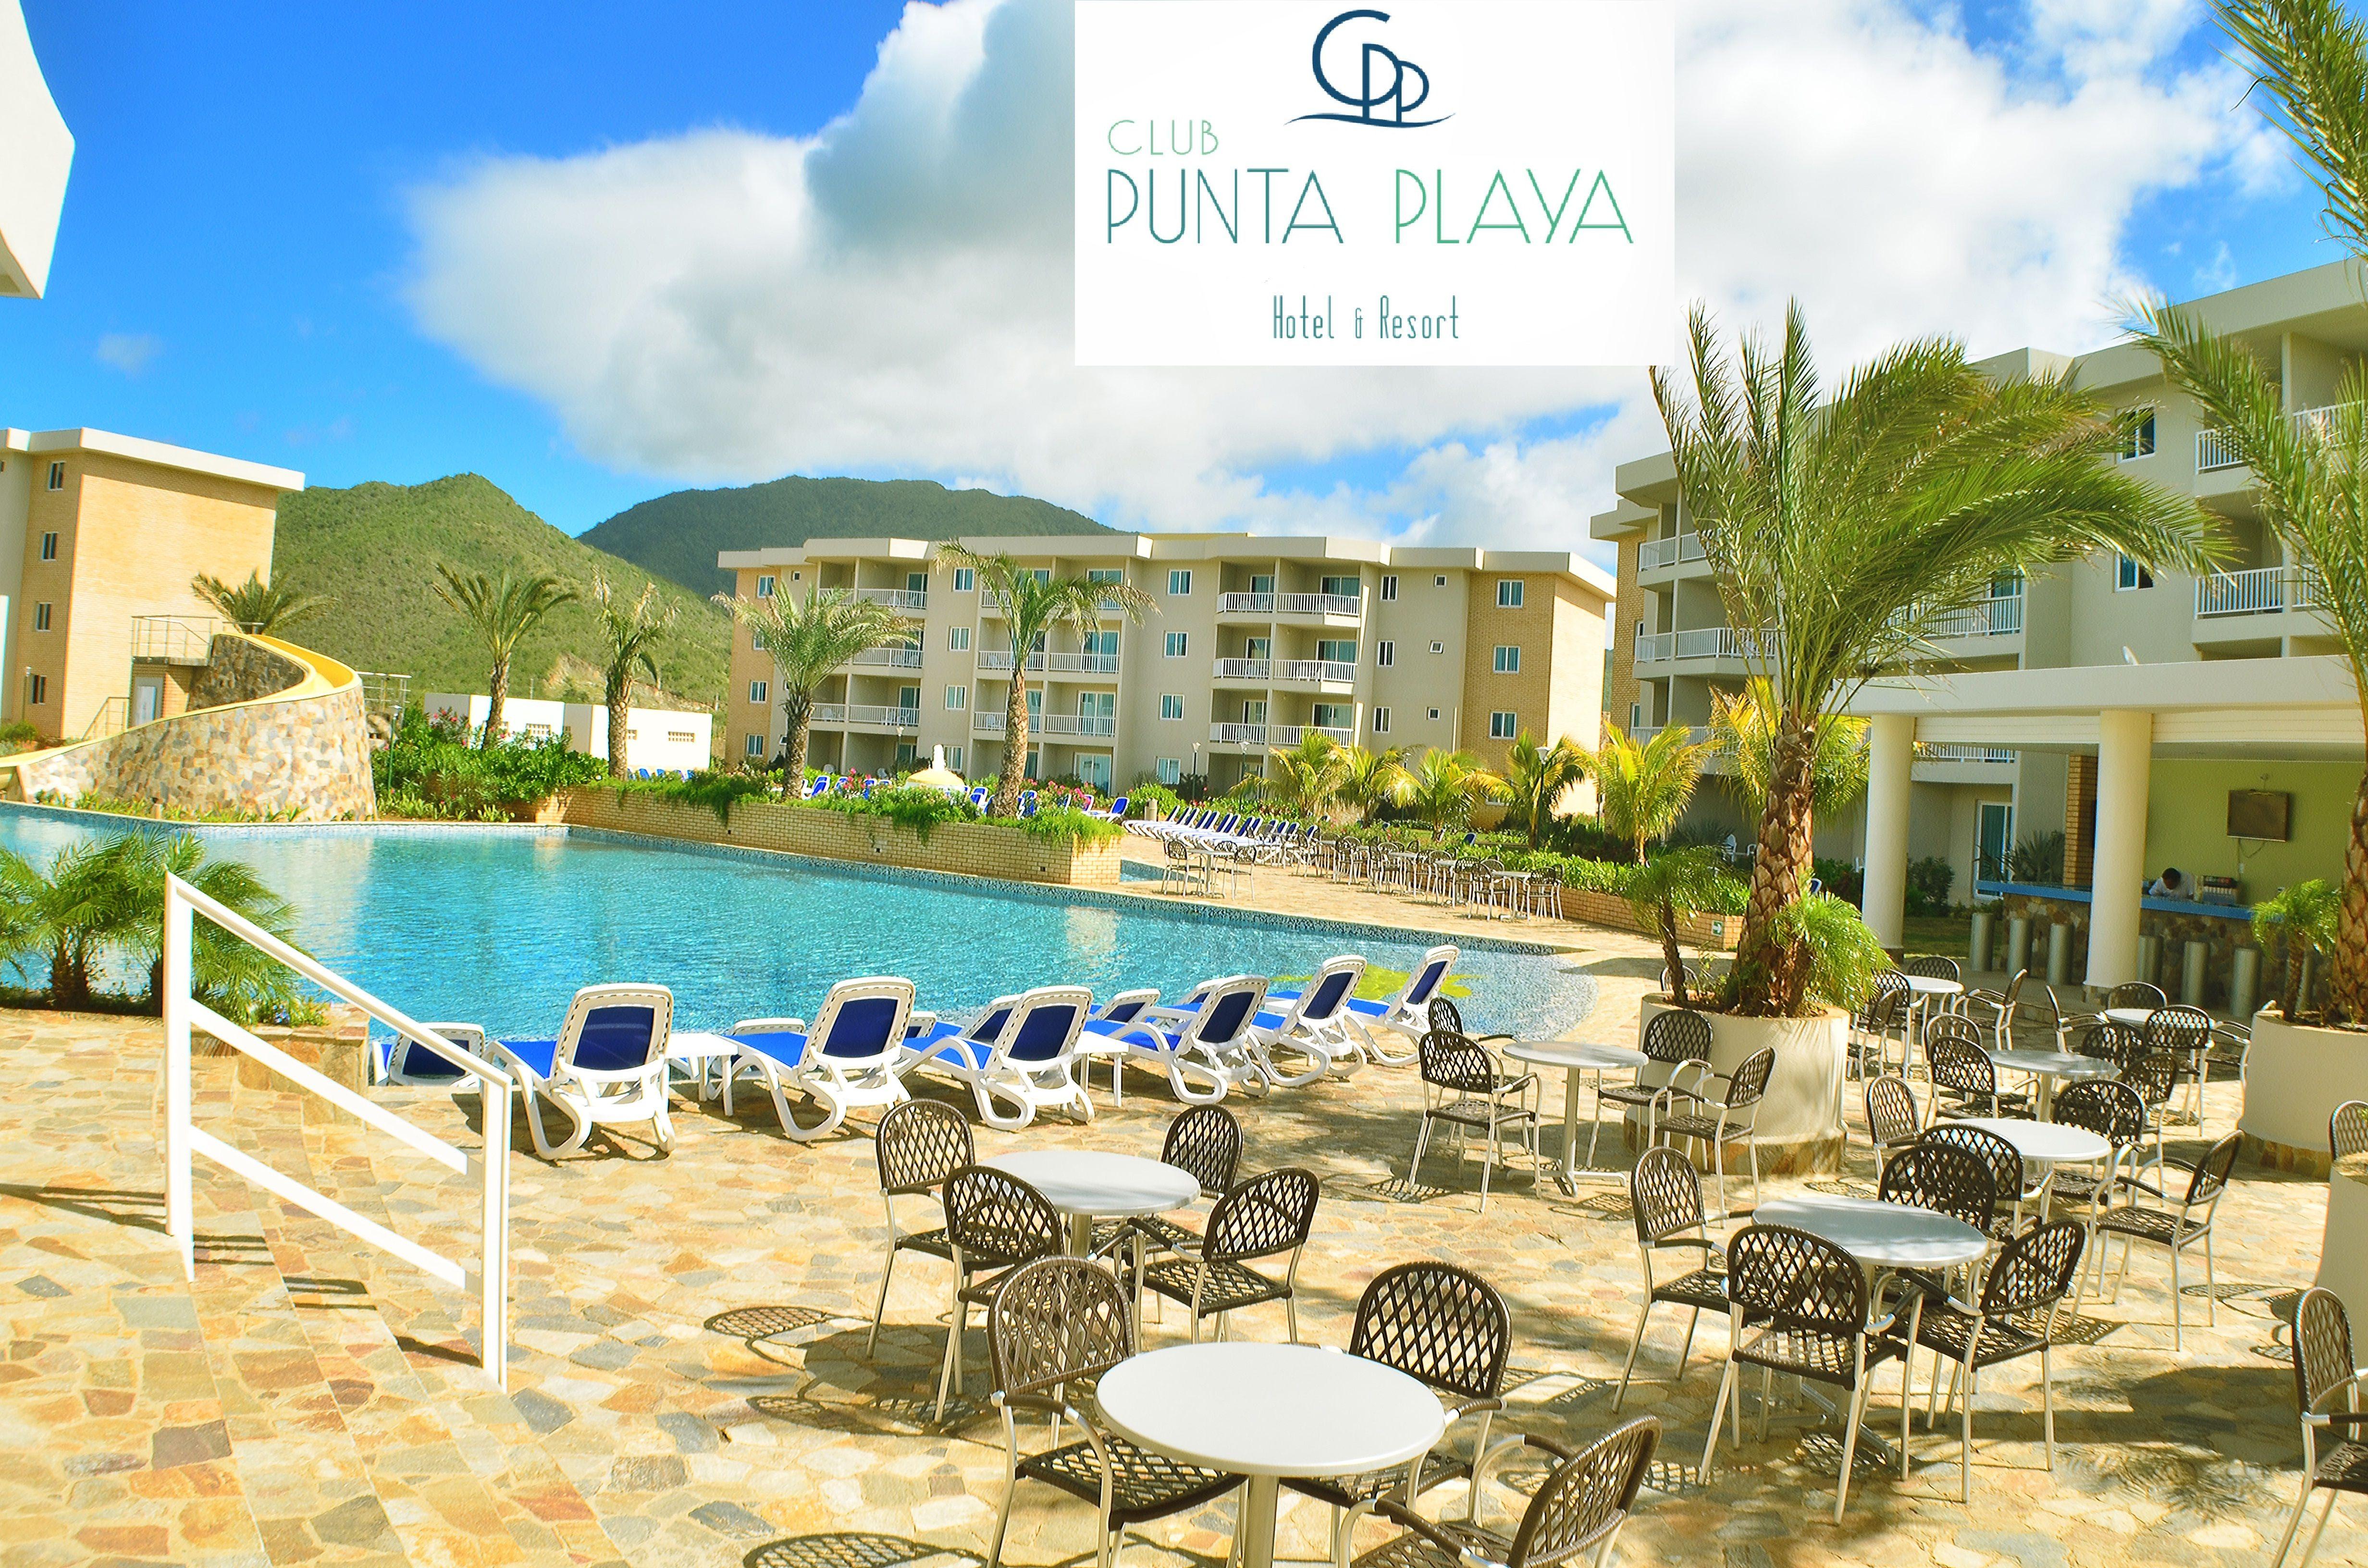 Club Punta Playa Playa Caribe Resort Mansions House Styles